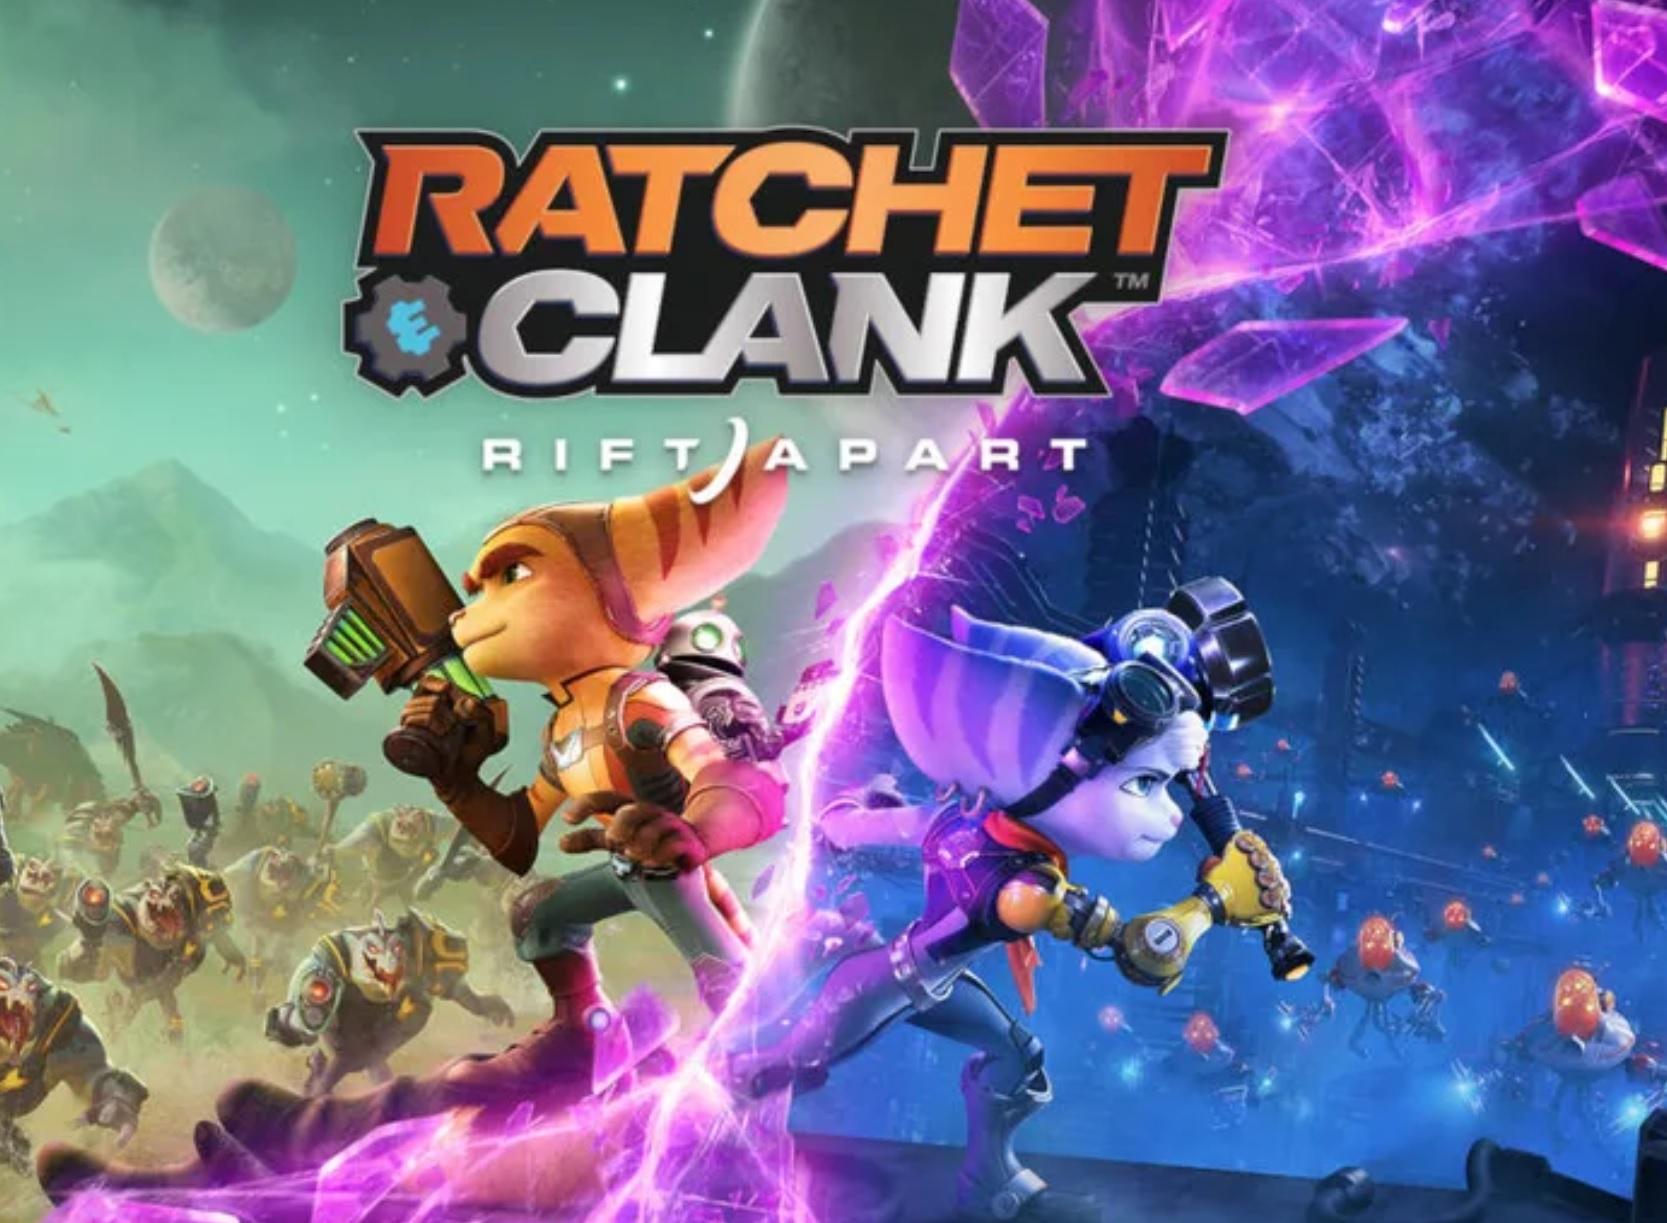 Ratchet & Clank Rift Apart arriva a giugno su PS5